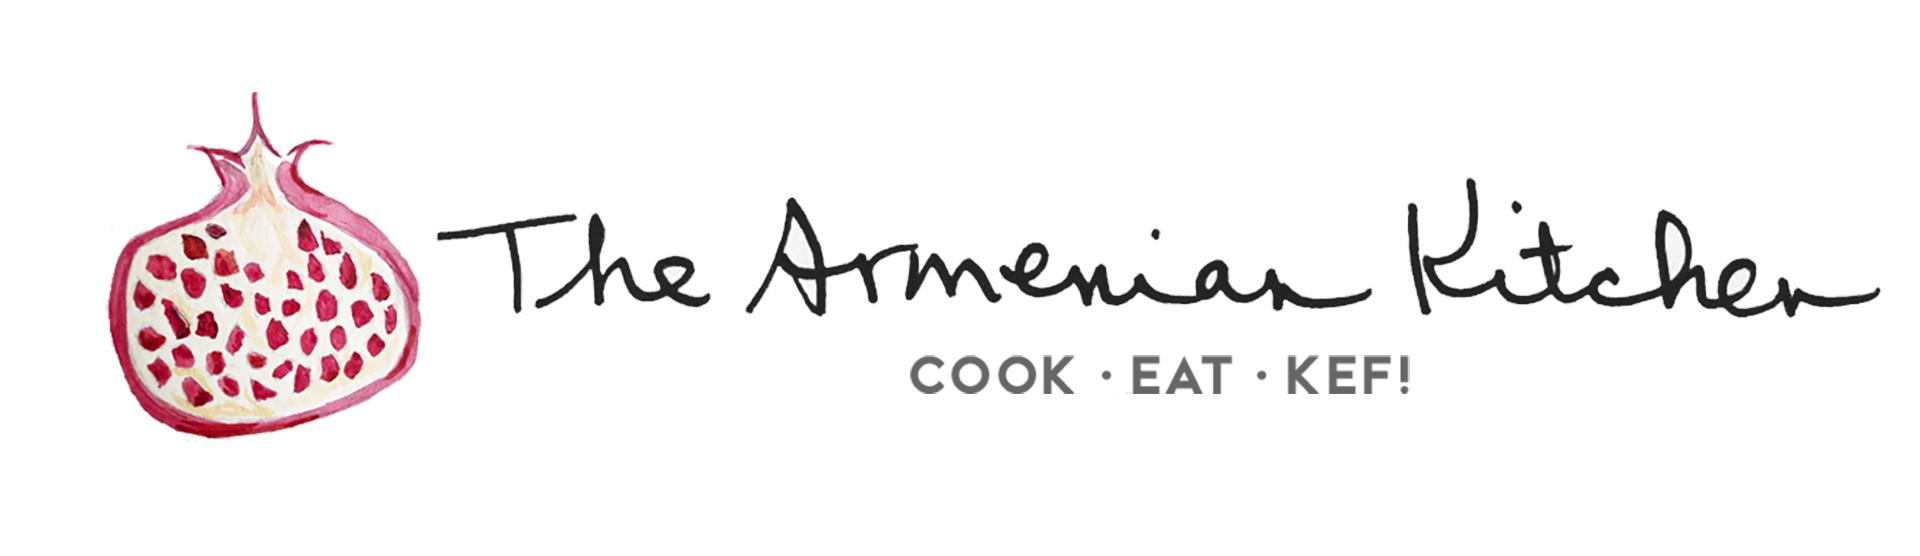 The Armenian Kitchen